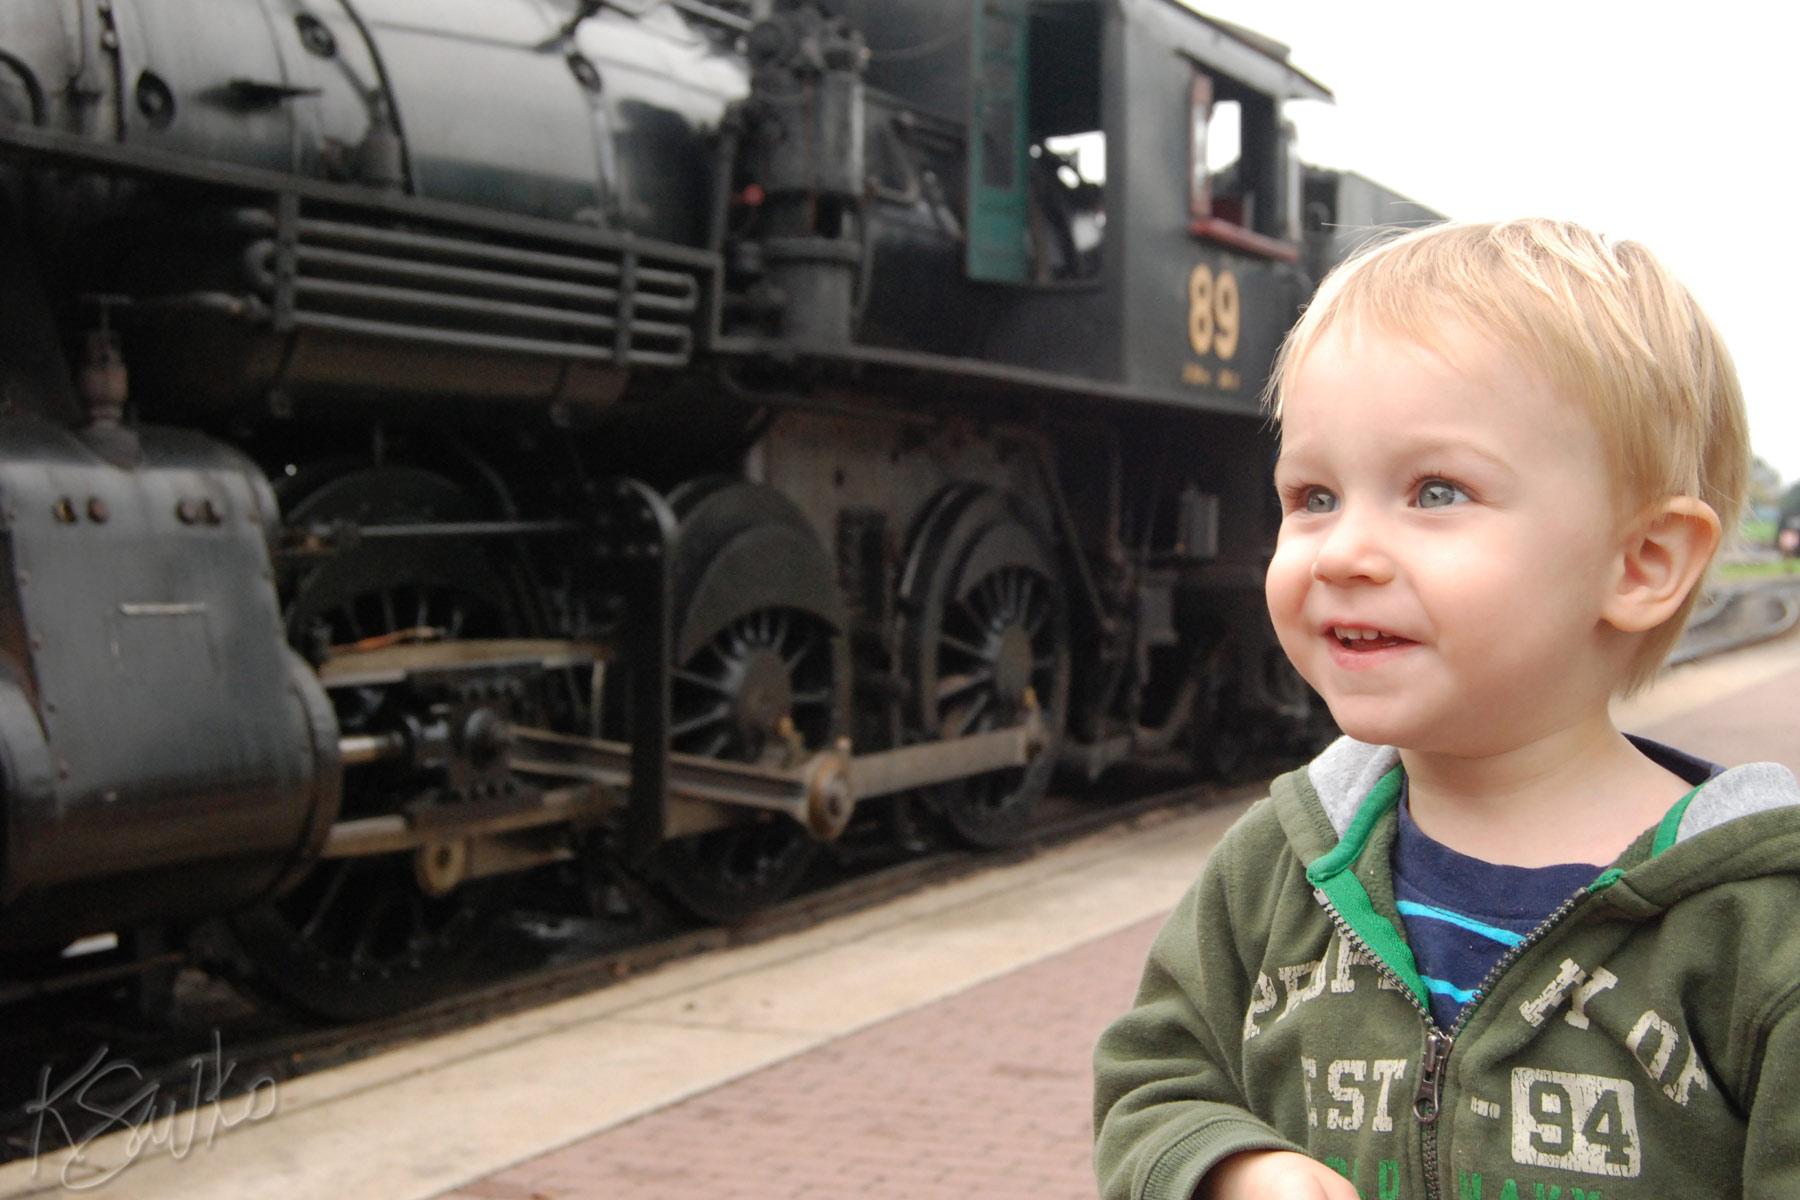 savko_train.jpg